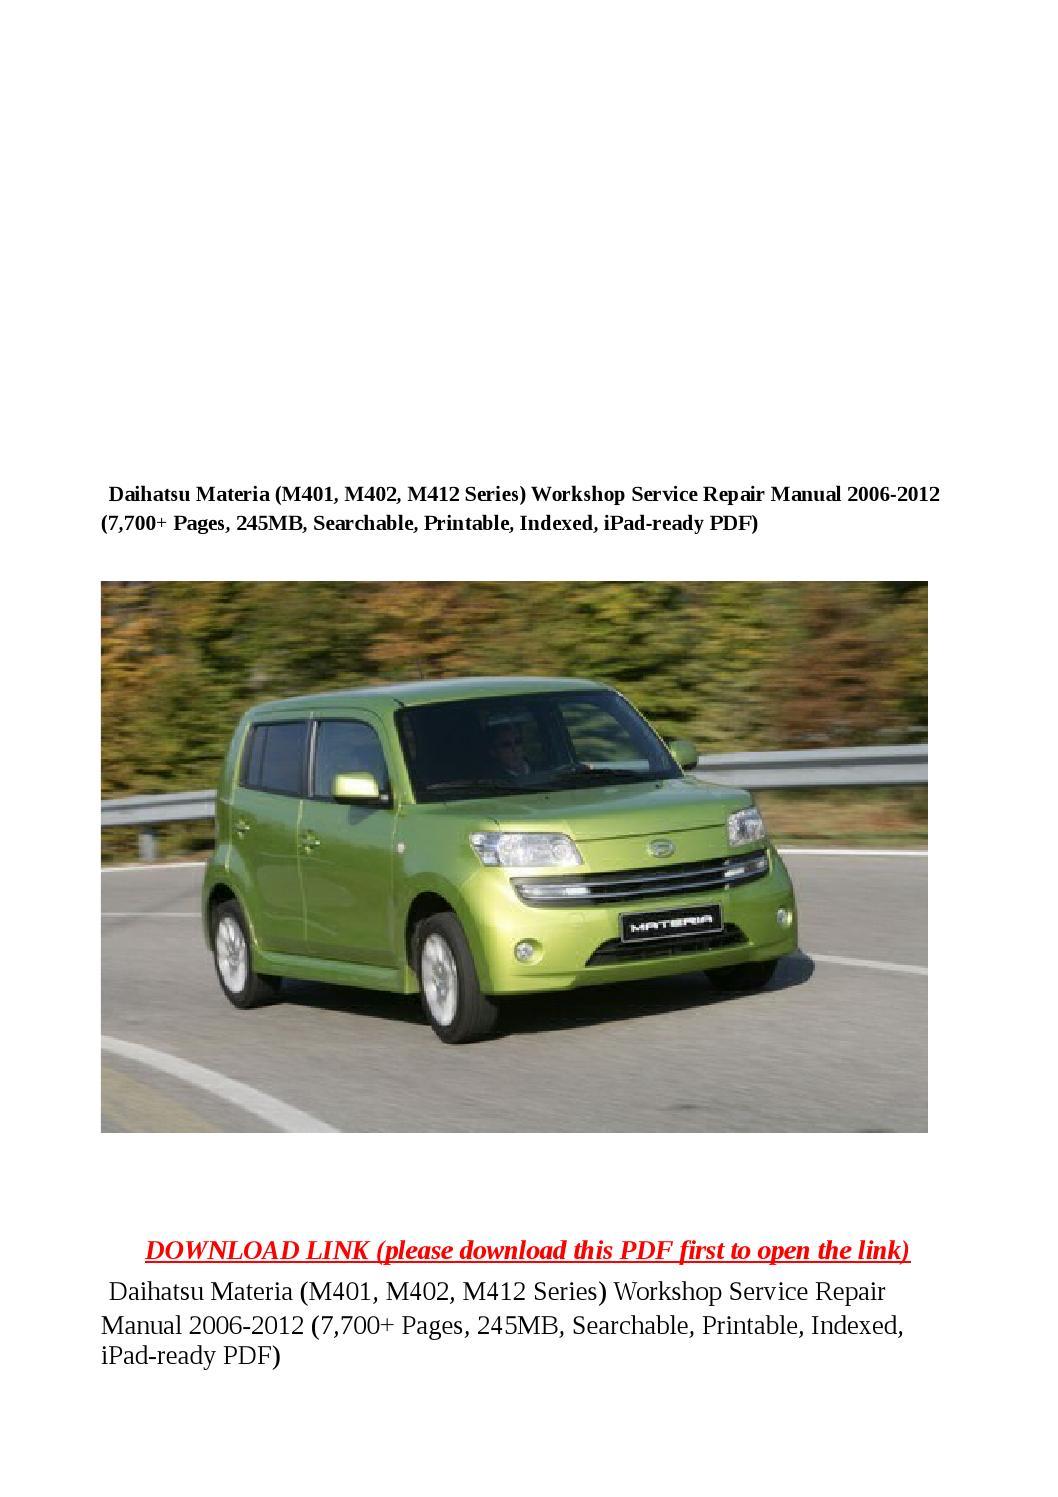 Daihatsu materia (m401, m402, m412 series) workshop service repair manual  2006 2012 (7,700 pages, 24 by dale - issuu